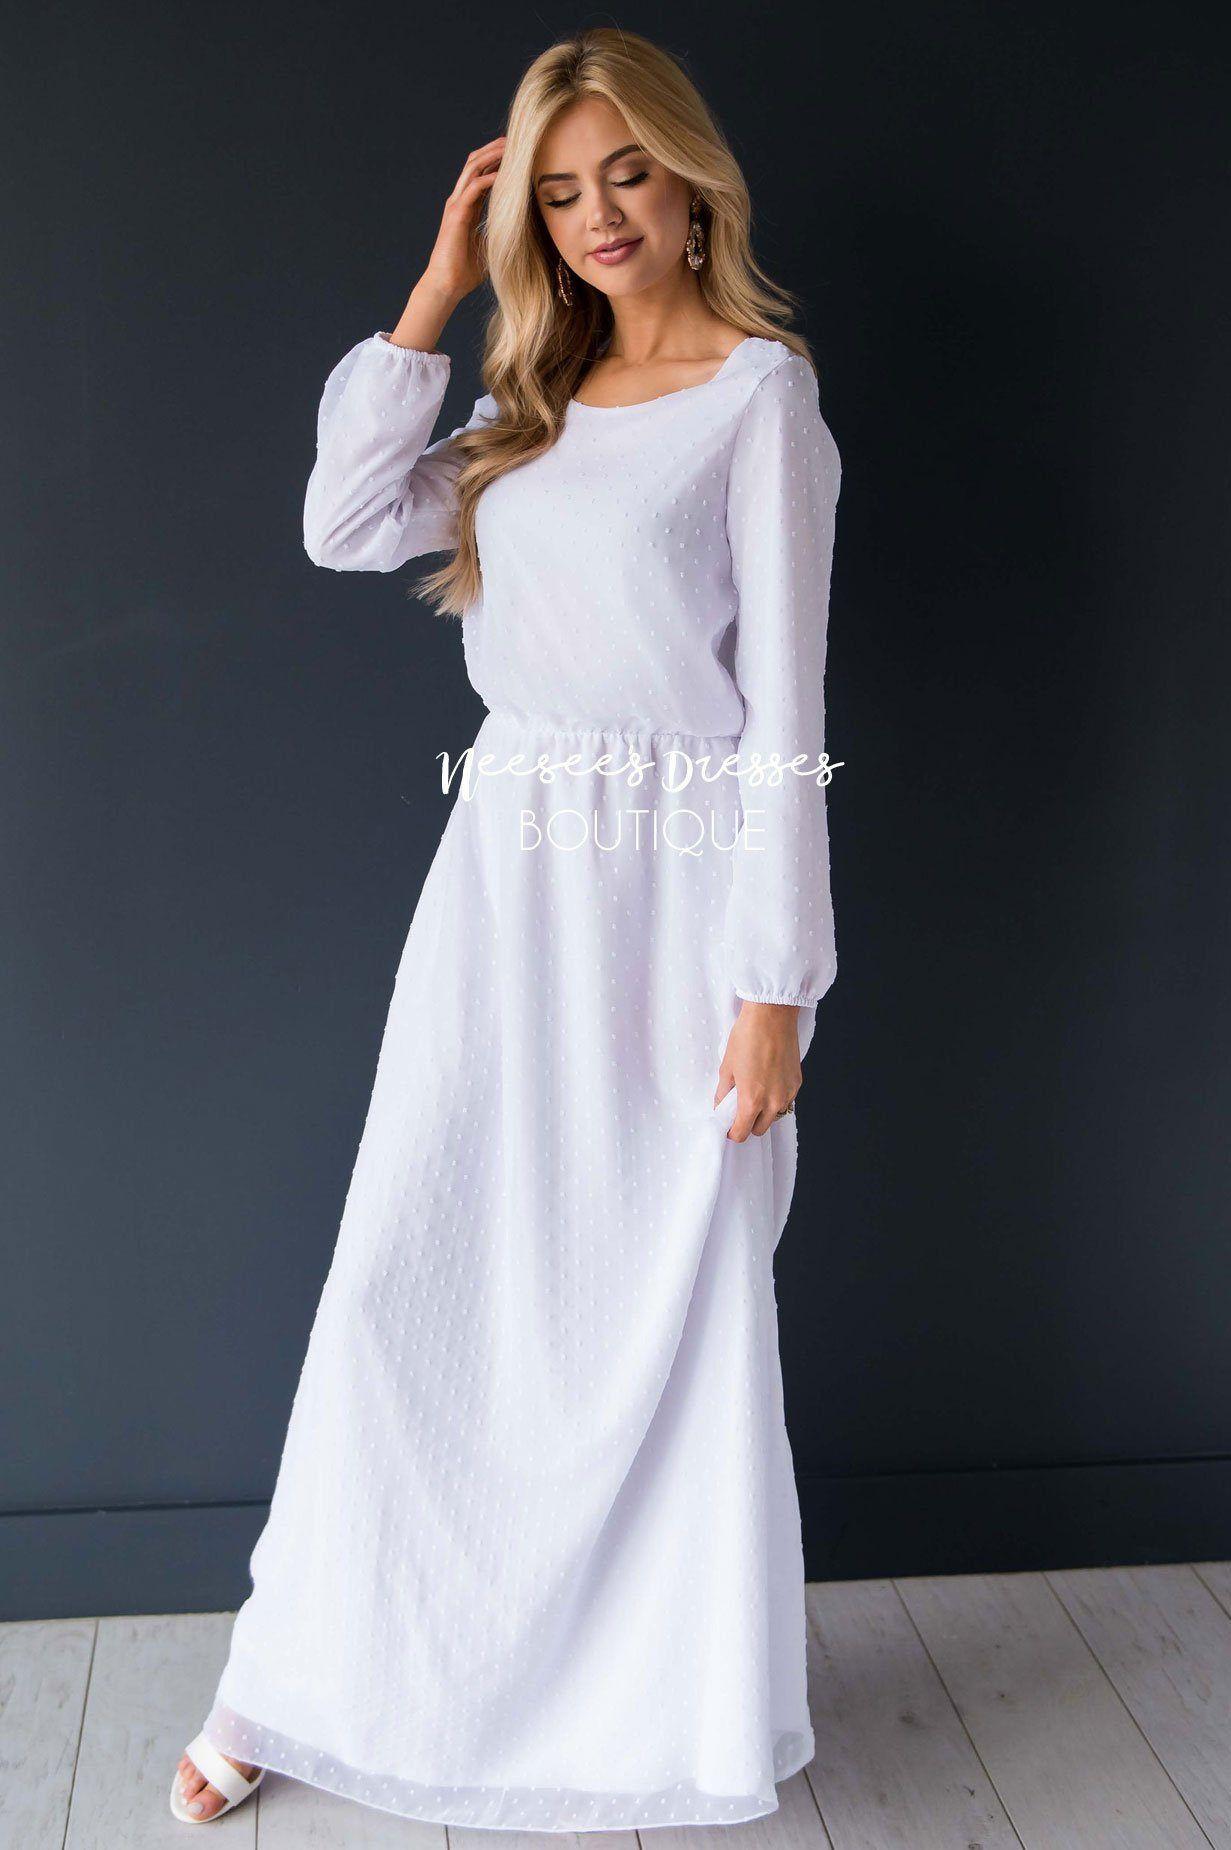 White Dotted Modest Temple Dress Beautiful White Temple Dresses Neesee S Dresses Modest Dresses Swiss Dot Dress Neesees Dresses [ 1850 x 1231 Pixel ]